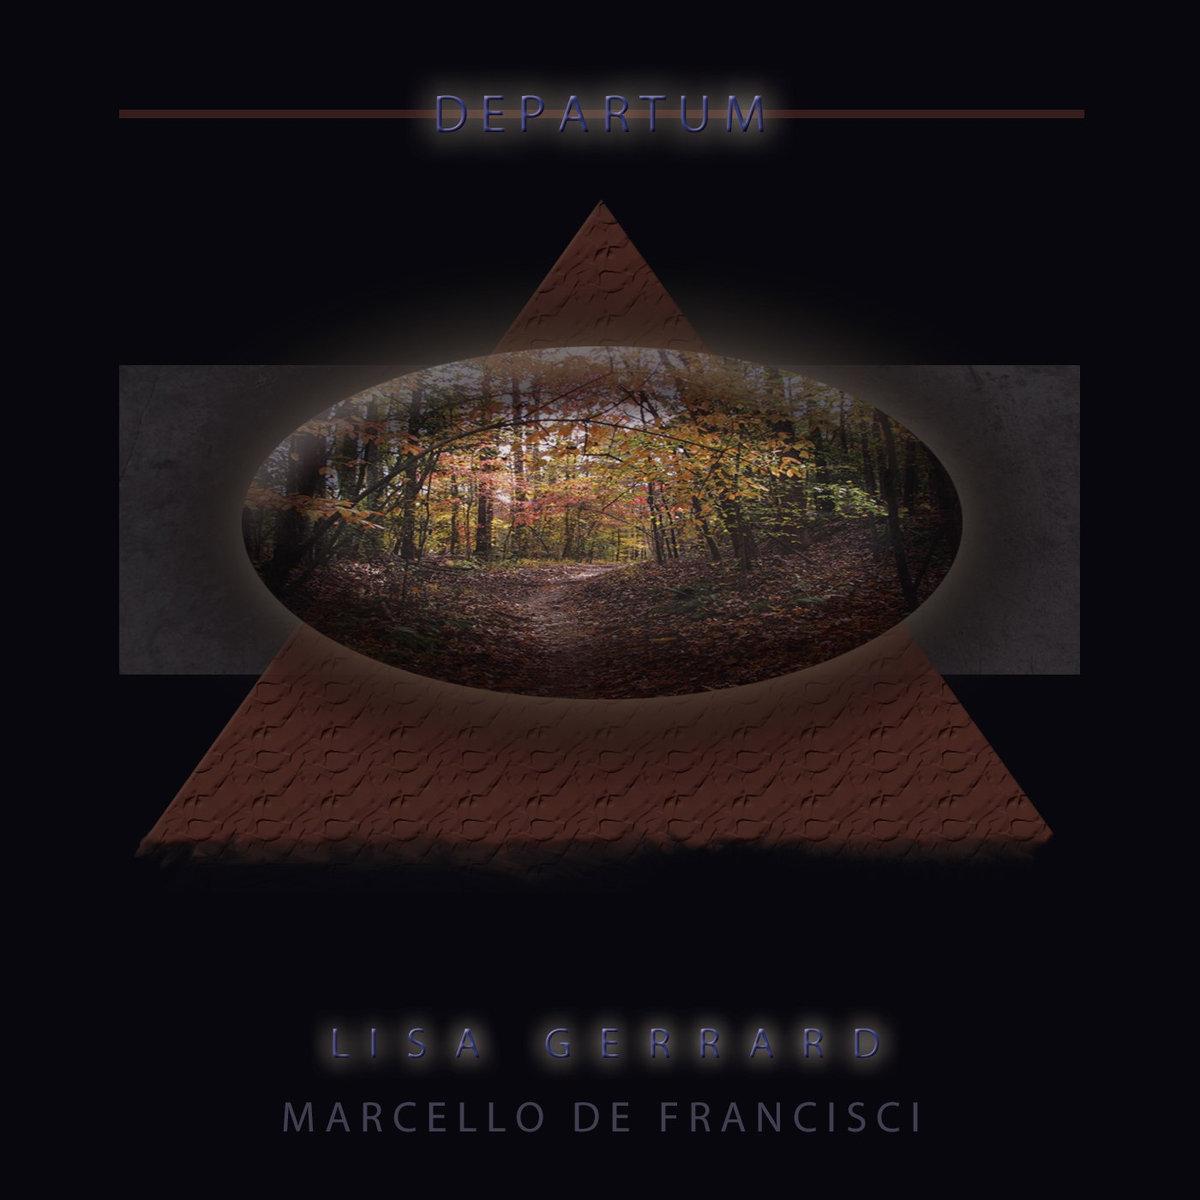 Lisa Gerrard / Marcello De Francisci - Departum